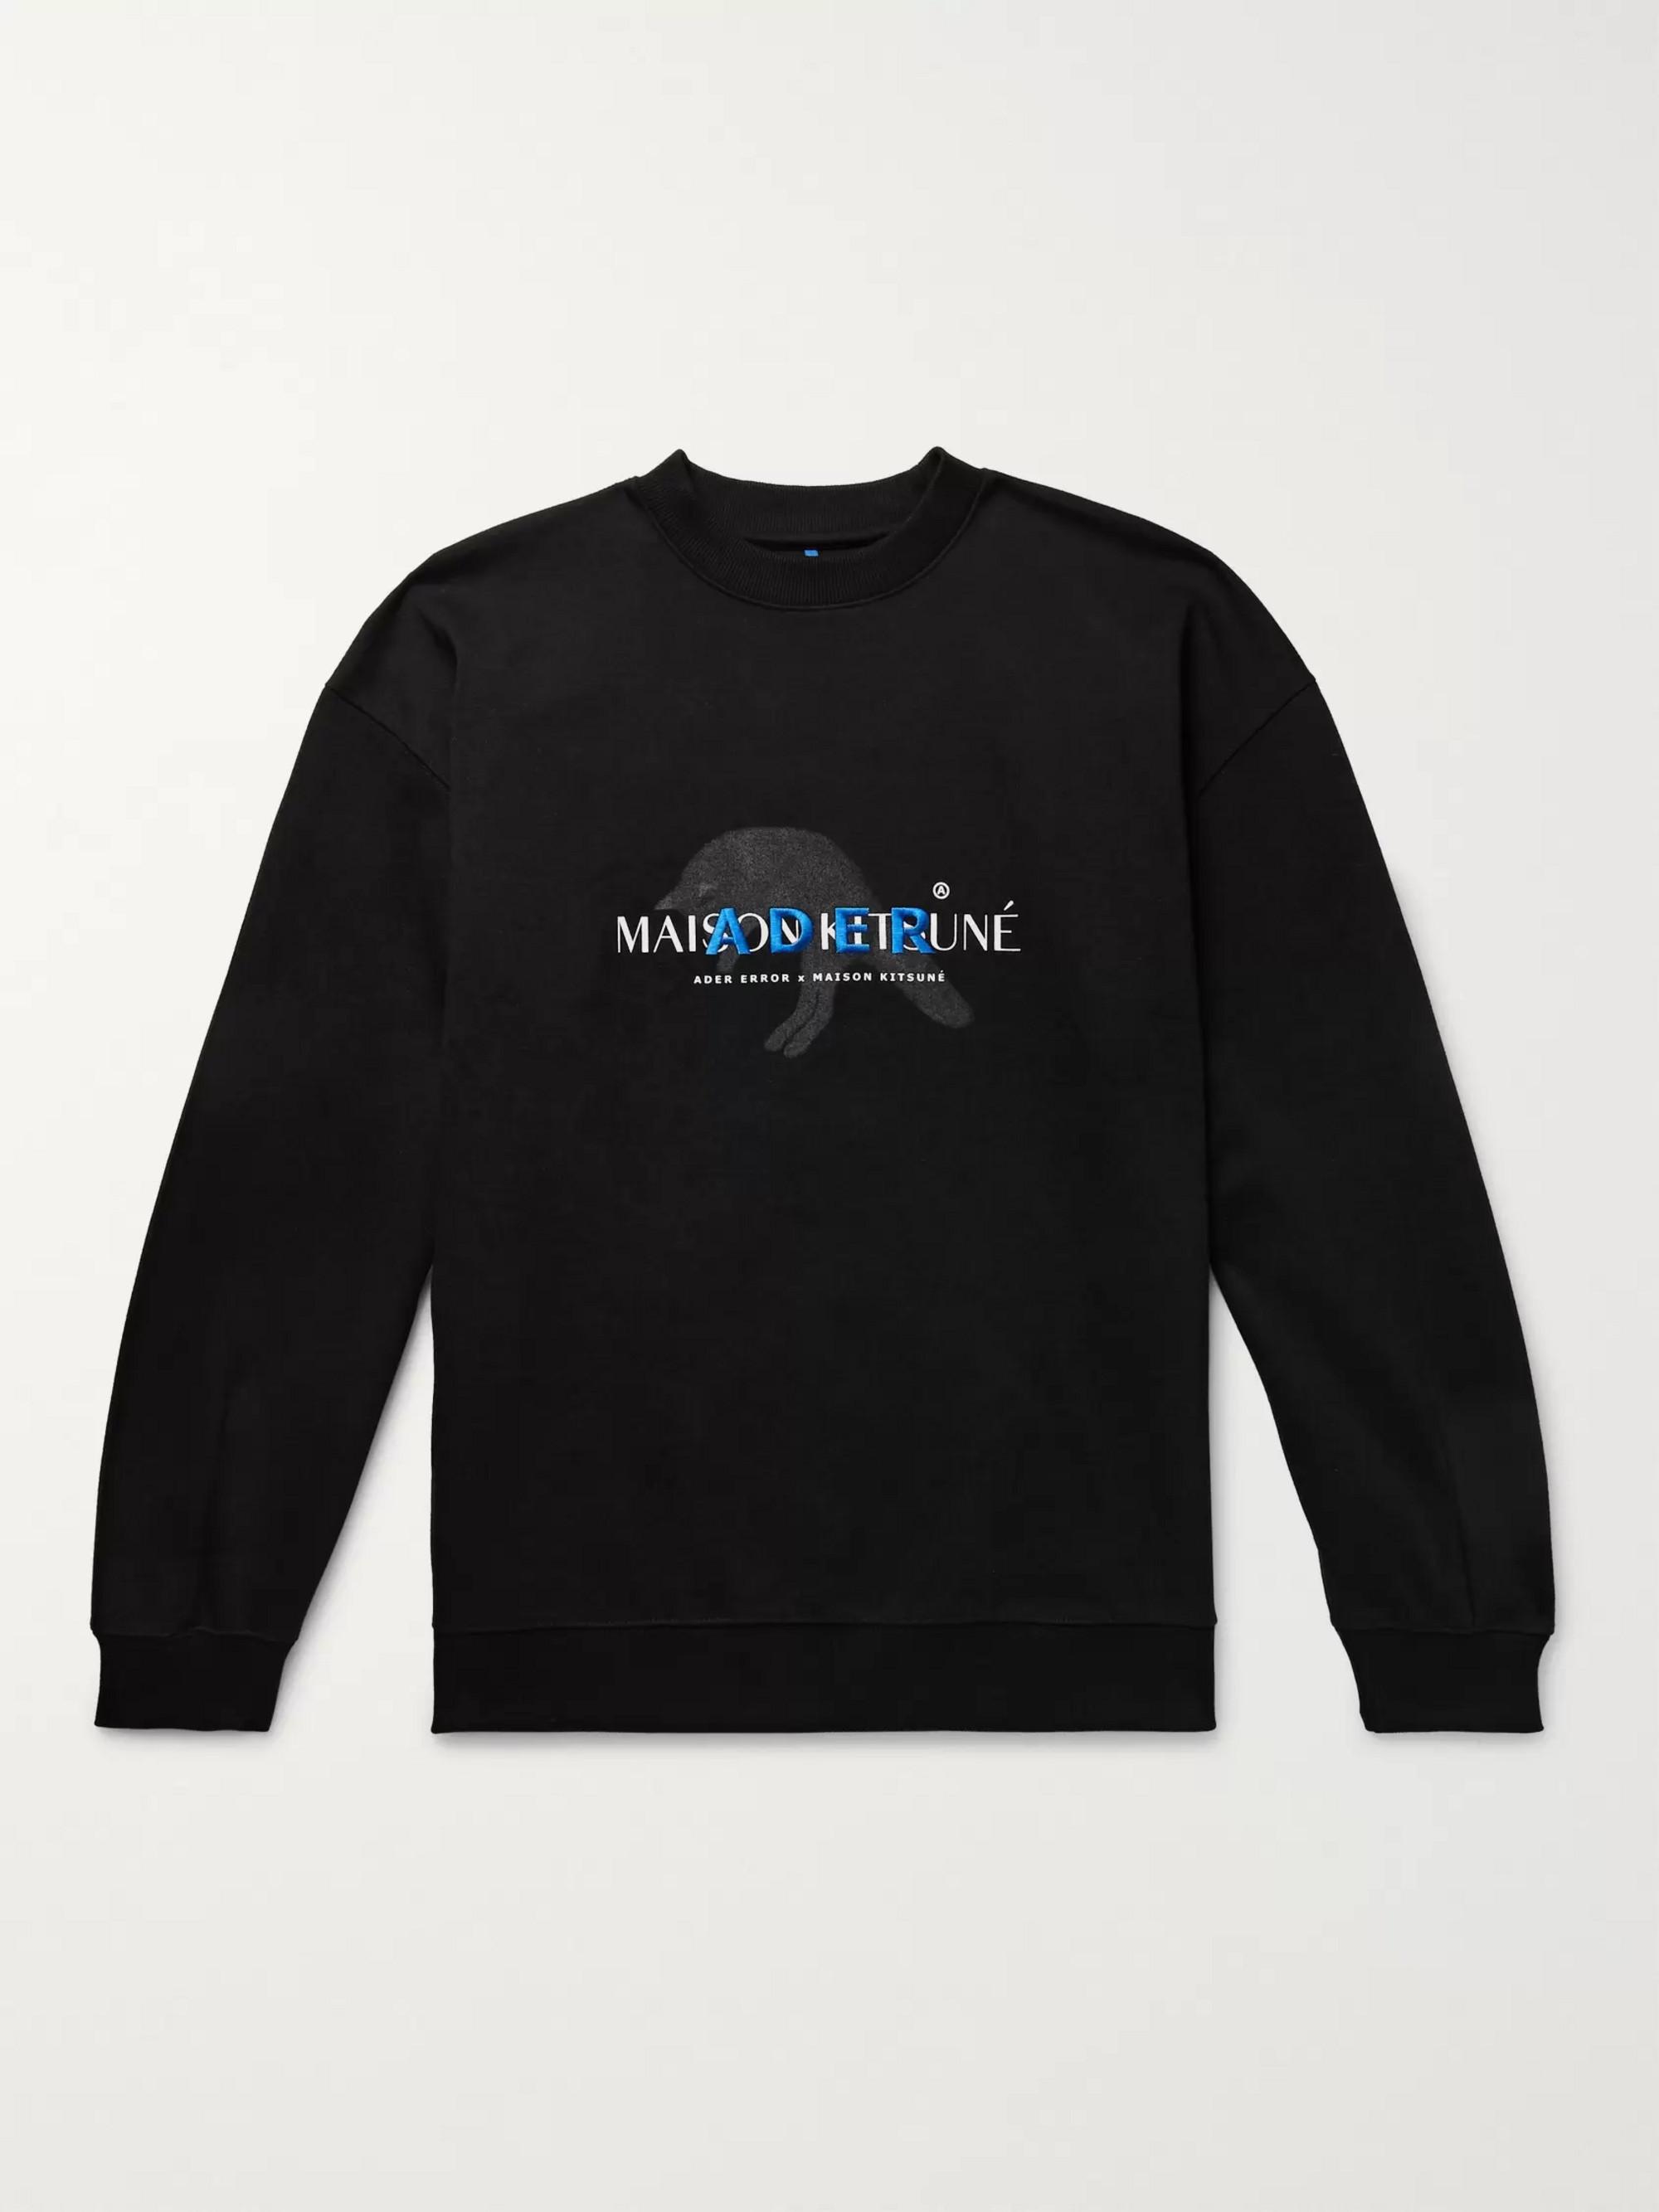 + Ader Error Oversized Logo Detailed Cotton Blend Jersey Sweatshirt by Maison Kitsuné